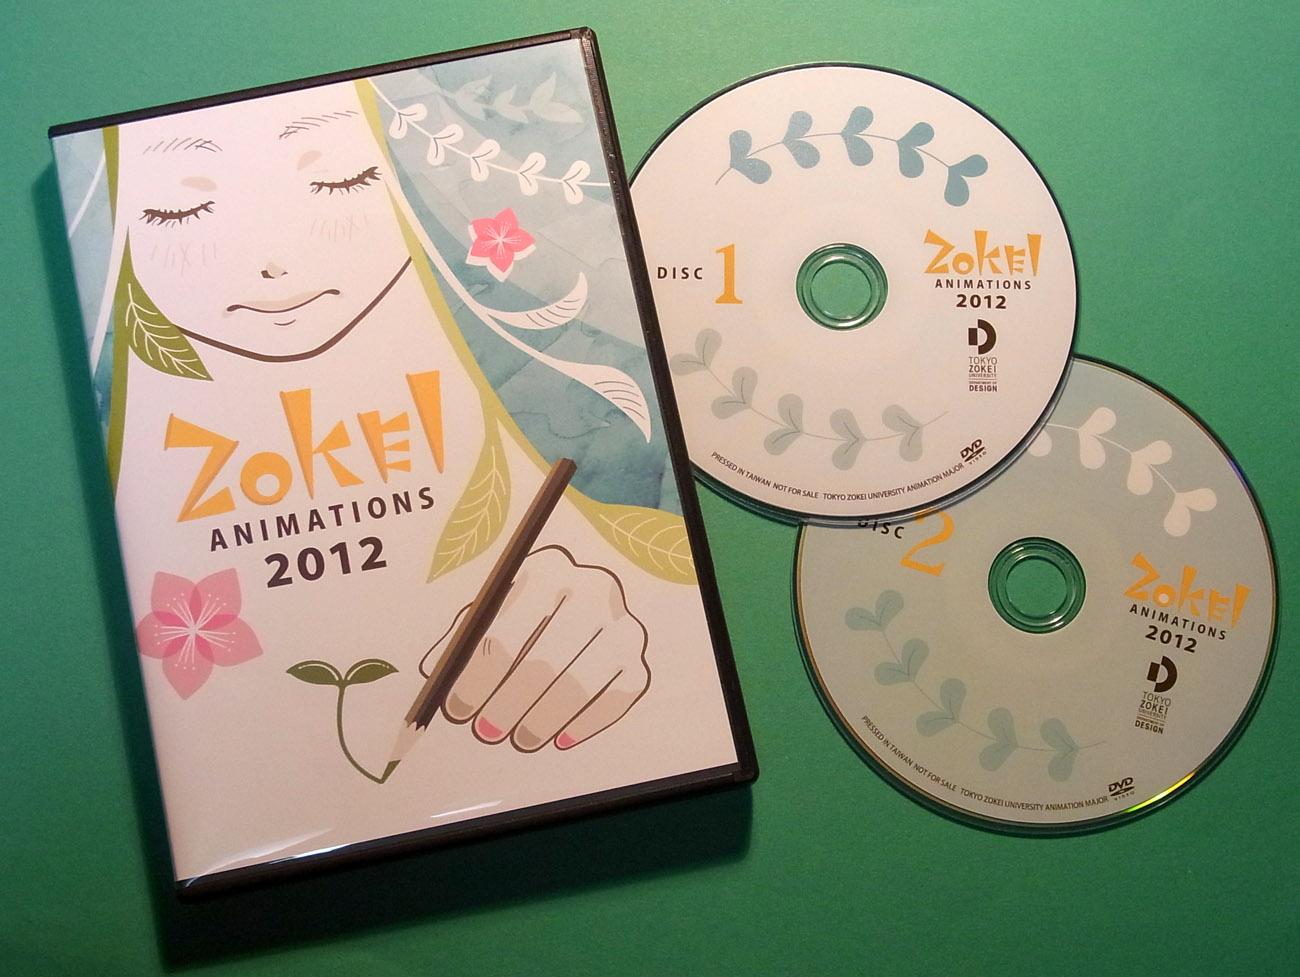 ZOKEI ANIMATIONS 2012